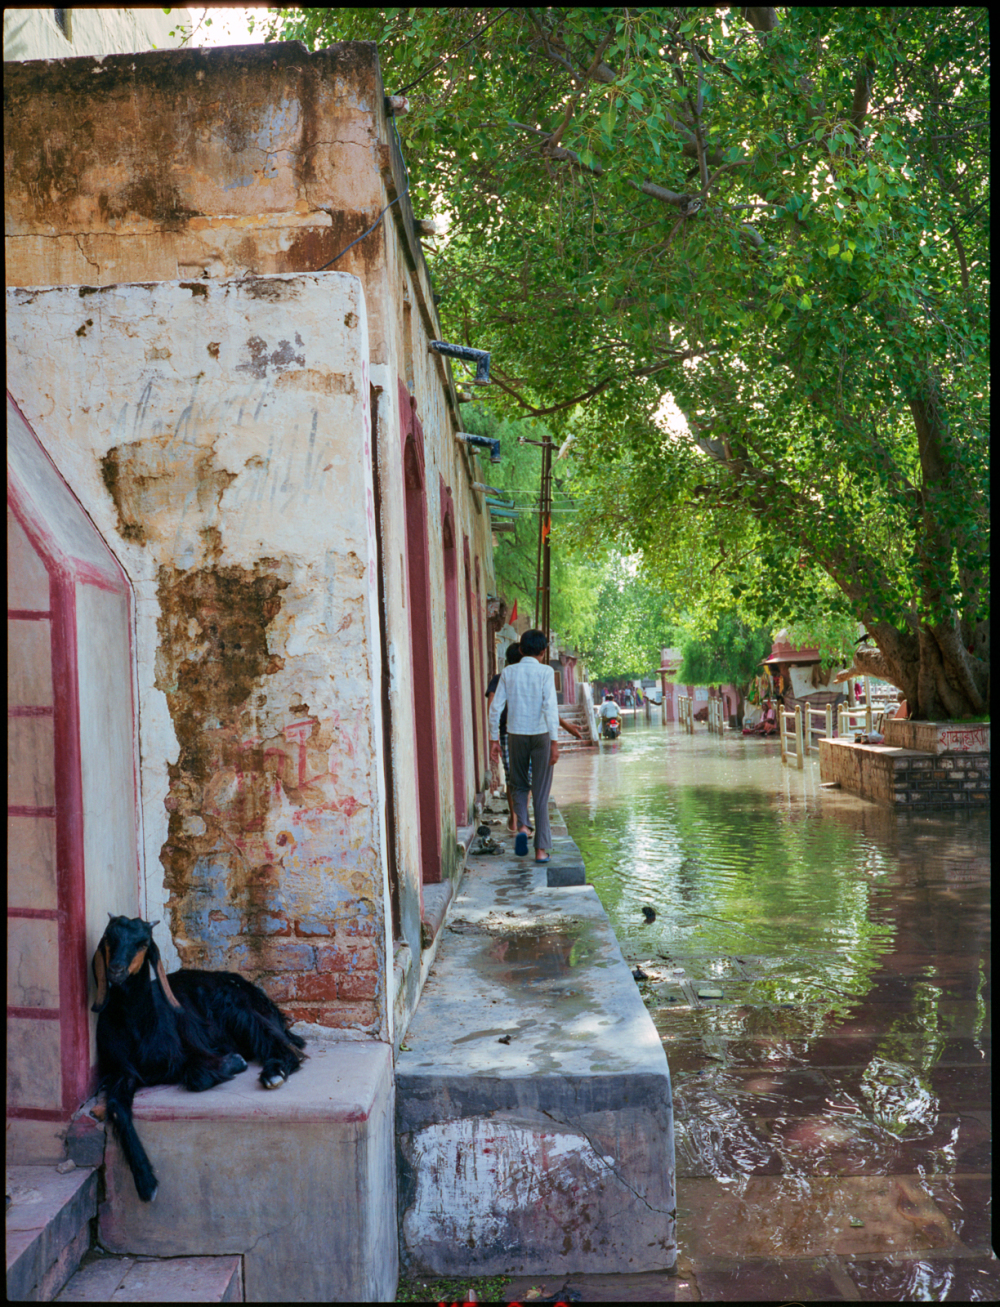 shri kolayat after monsun, rajasthan, india